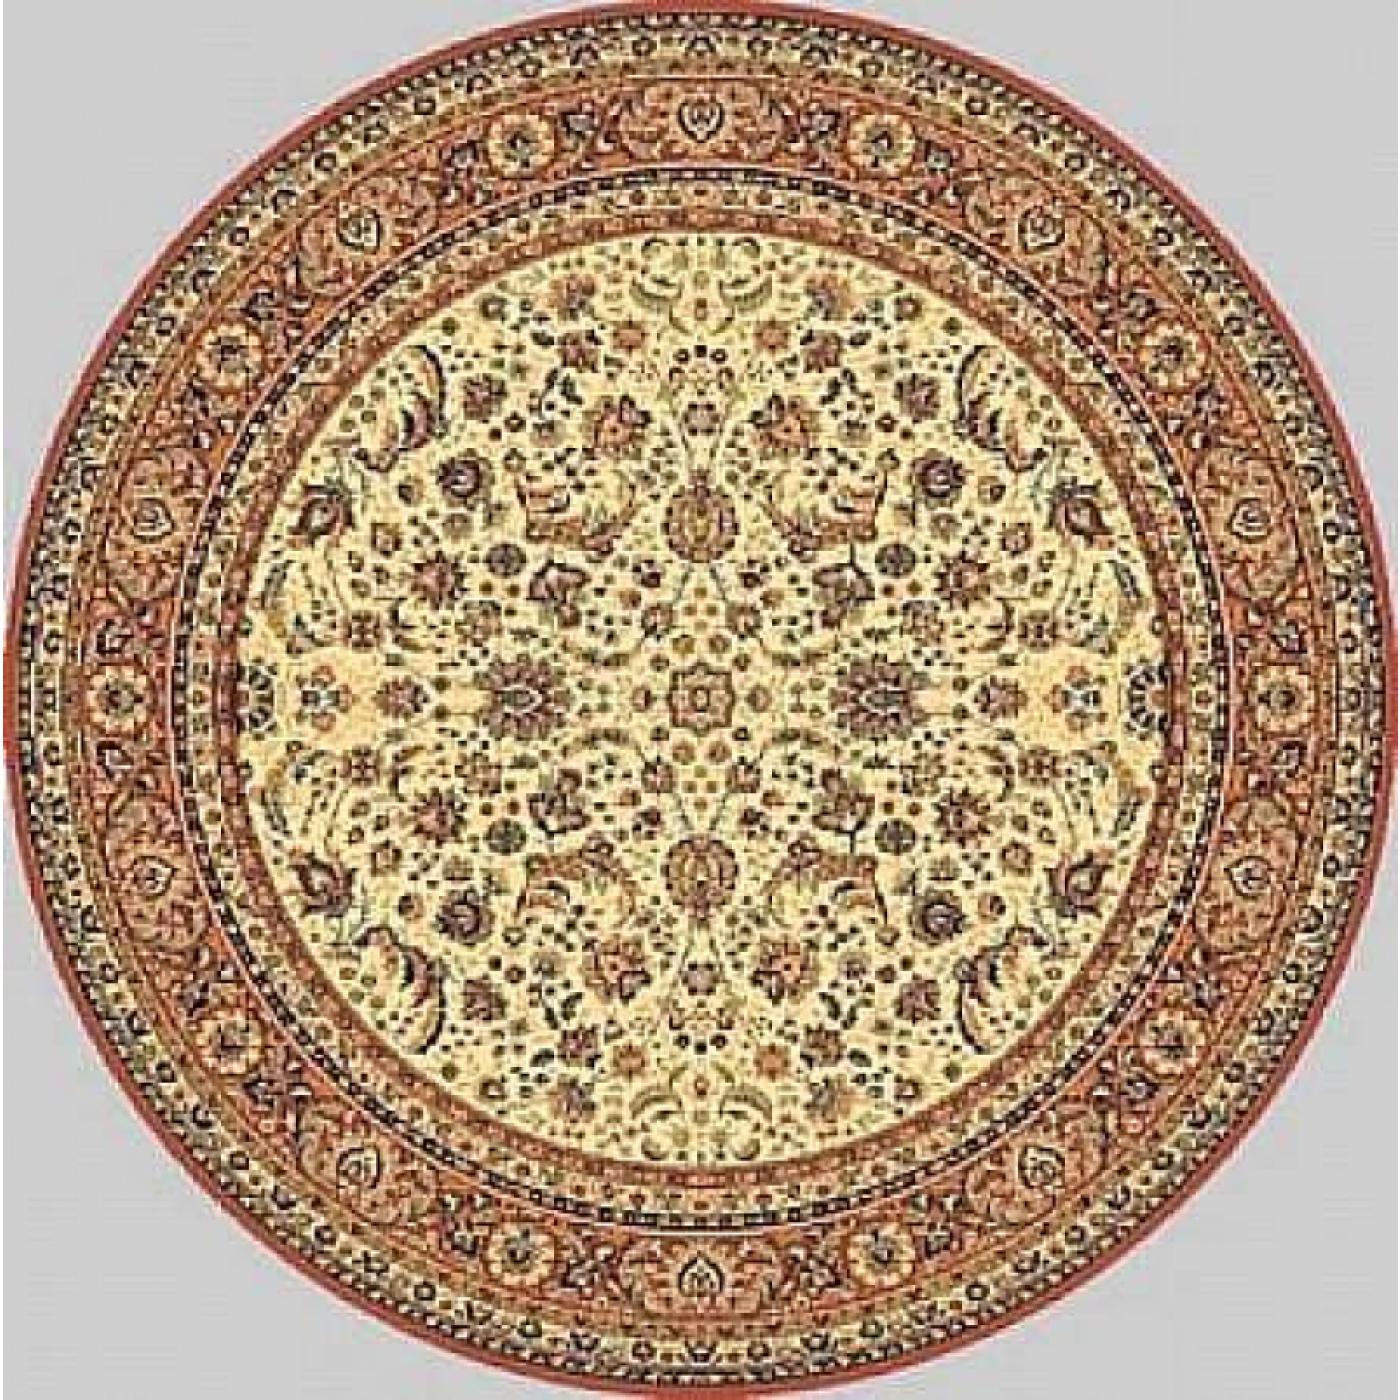 Lano Kasbah S 13720-471 rond